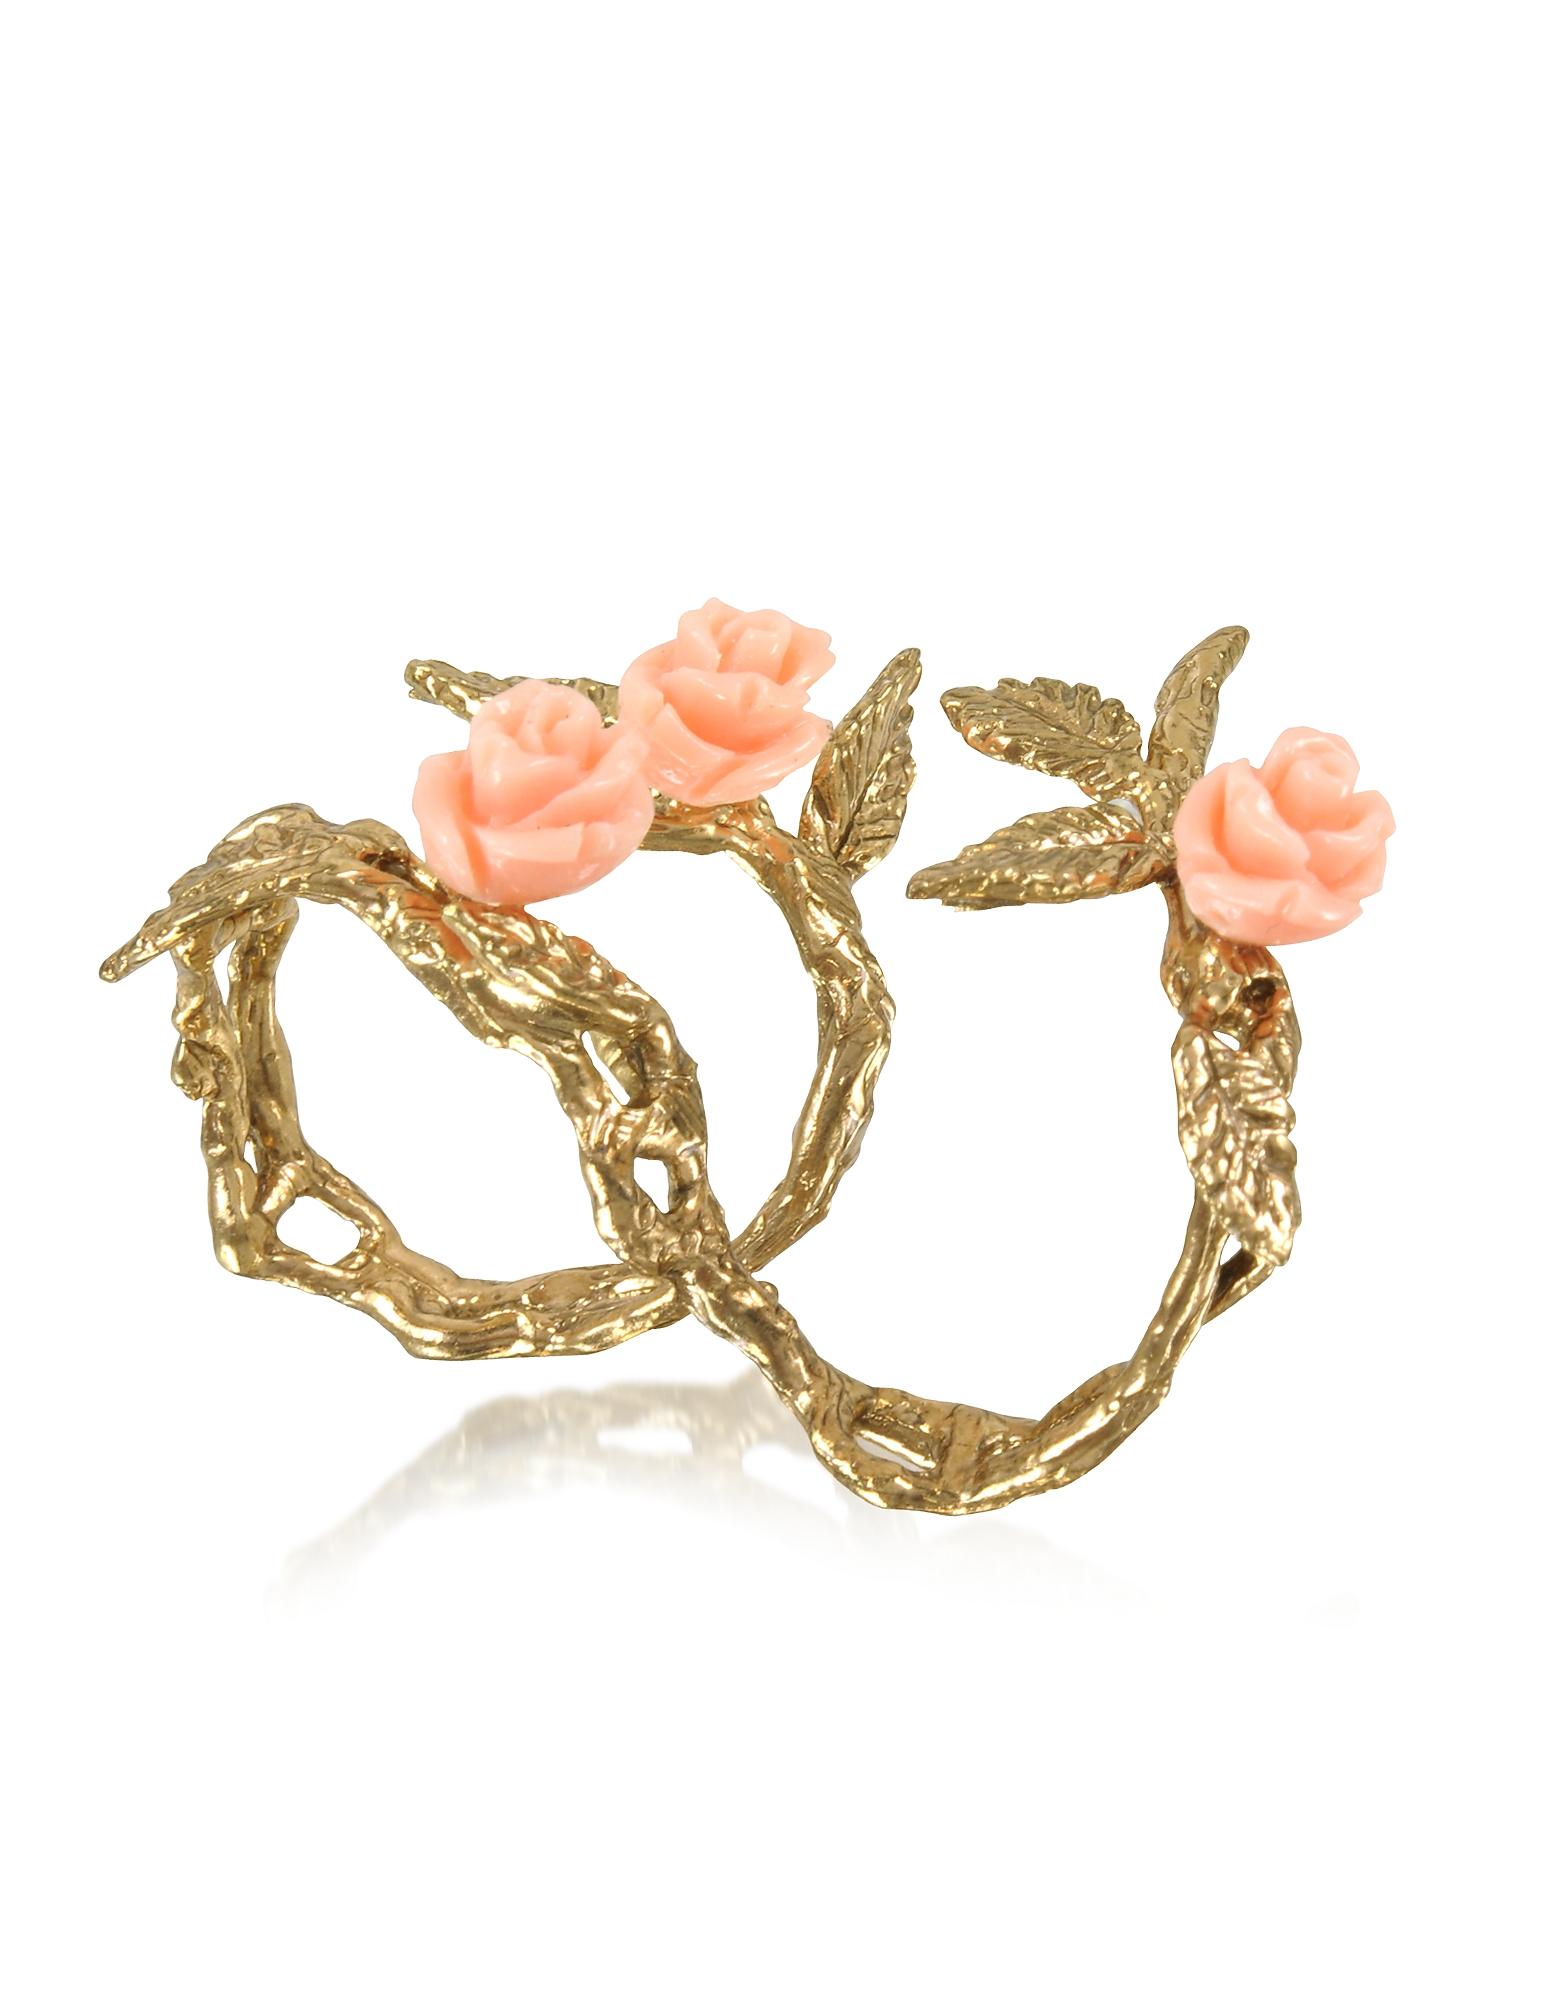 Bernard Delettrez Rings, Two Fingers Leafy Bronze Ring w/3 Pink Resin Roses